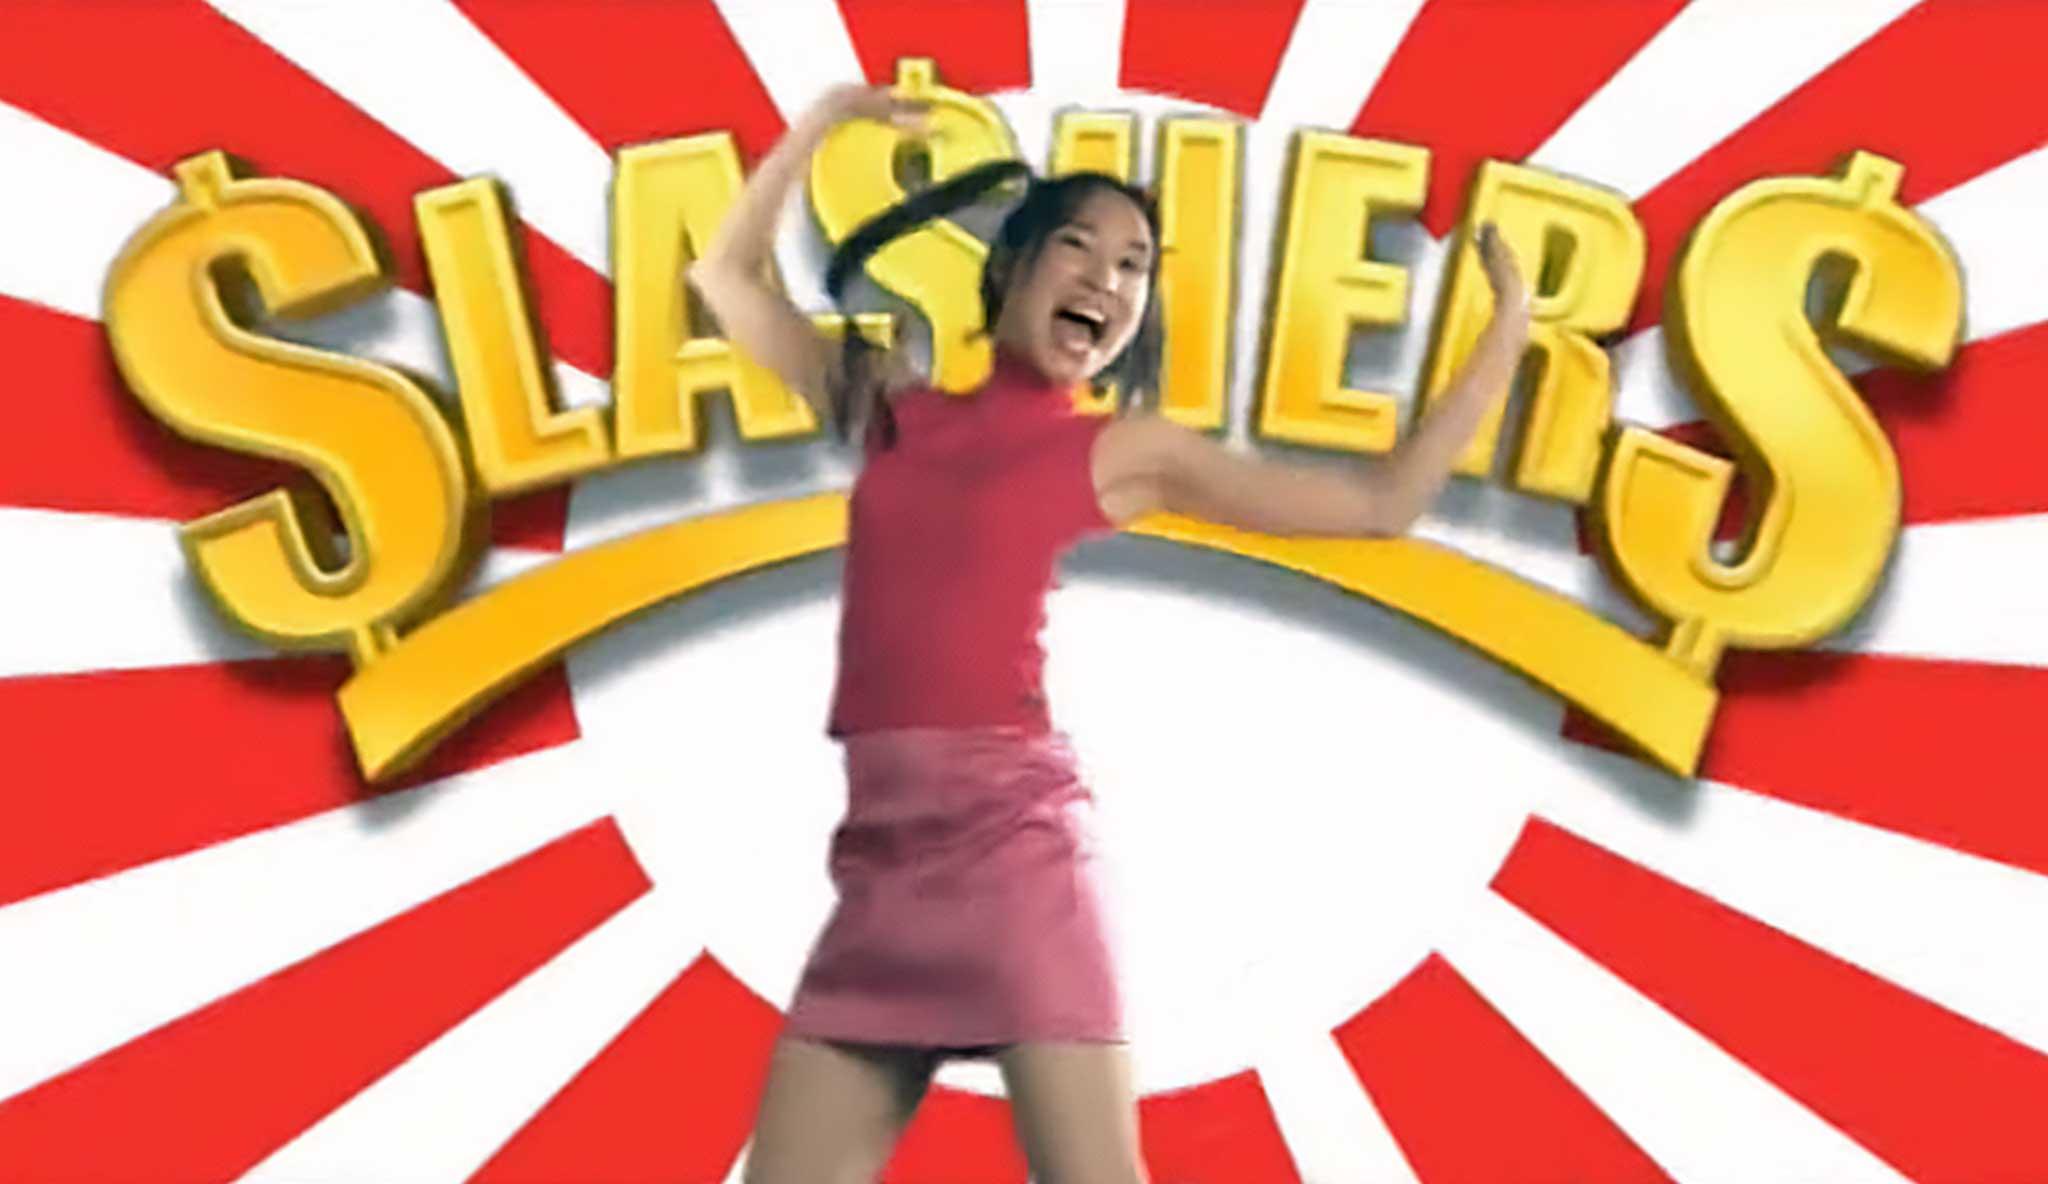 slashers\header.jpg